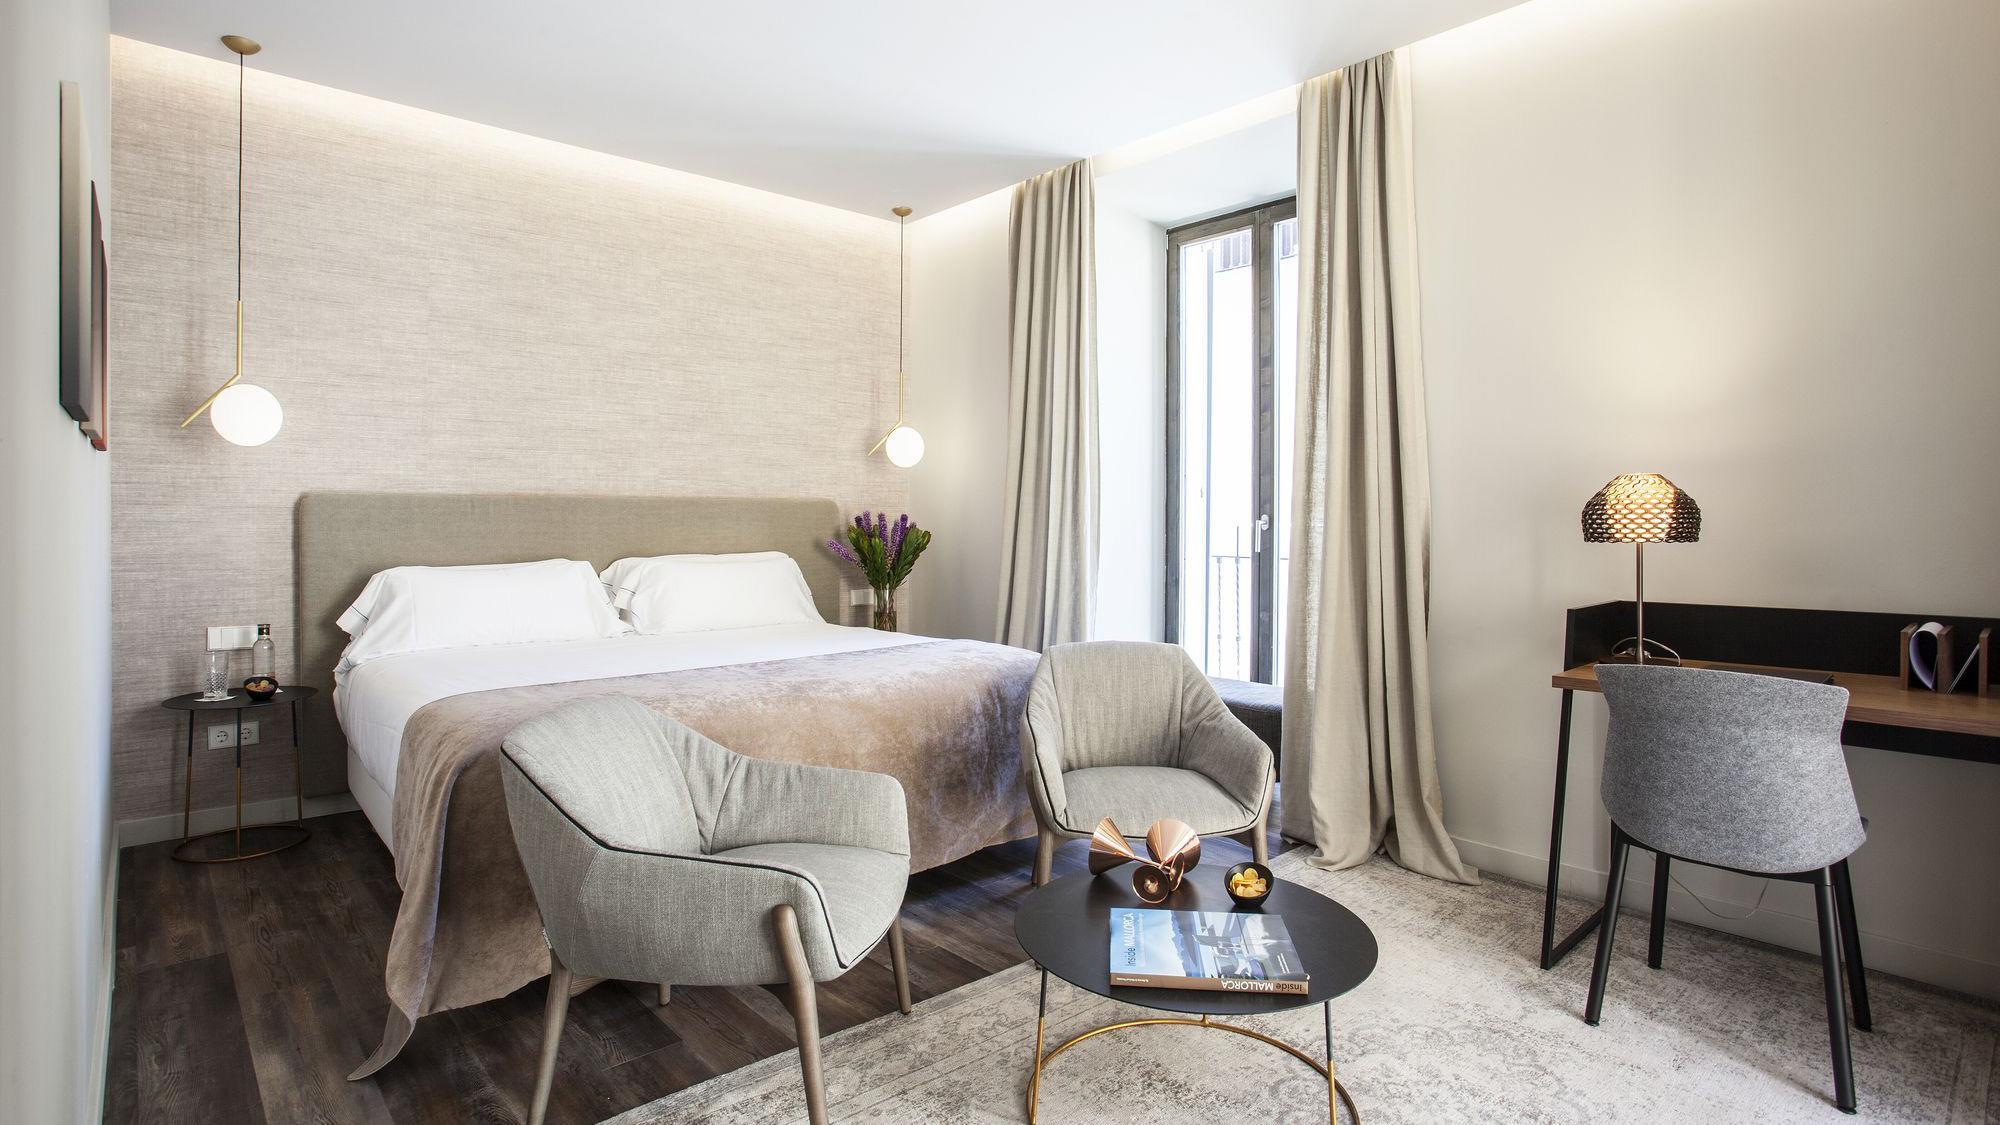 boutique-hotel-sant-jaume-palma-de-mallorca-deluxe-room.jpg